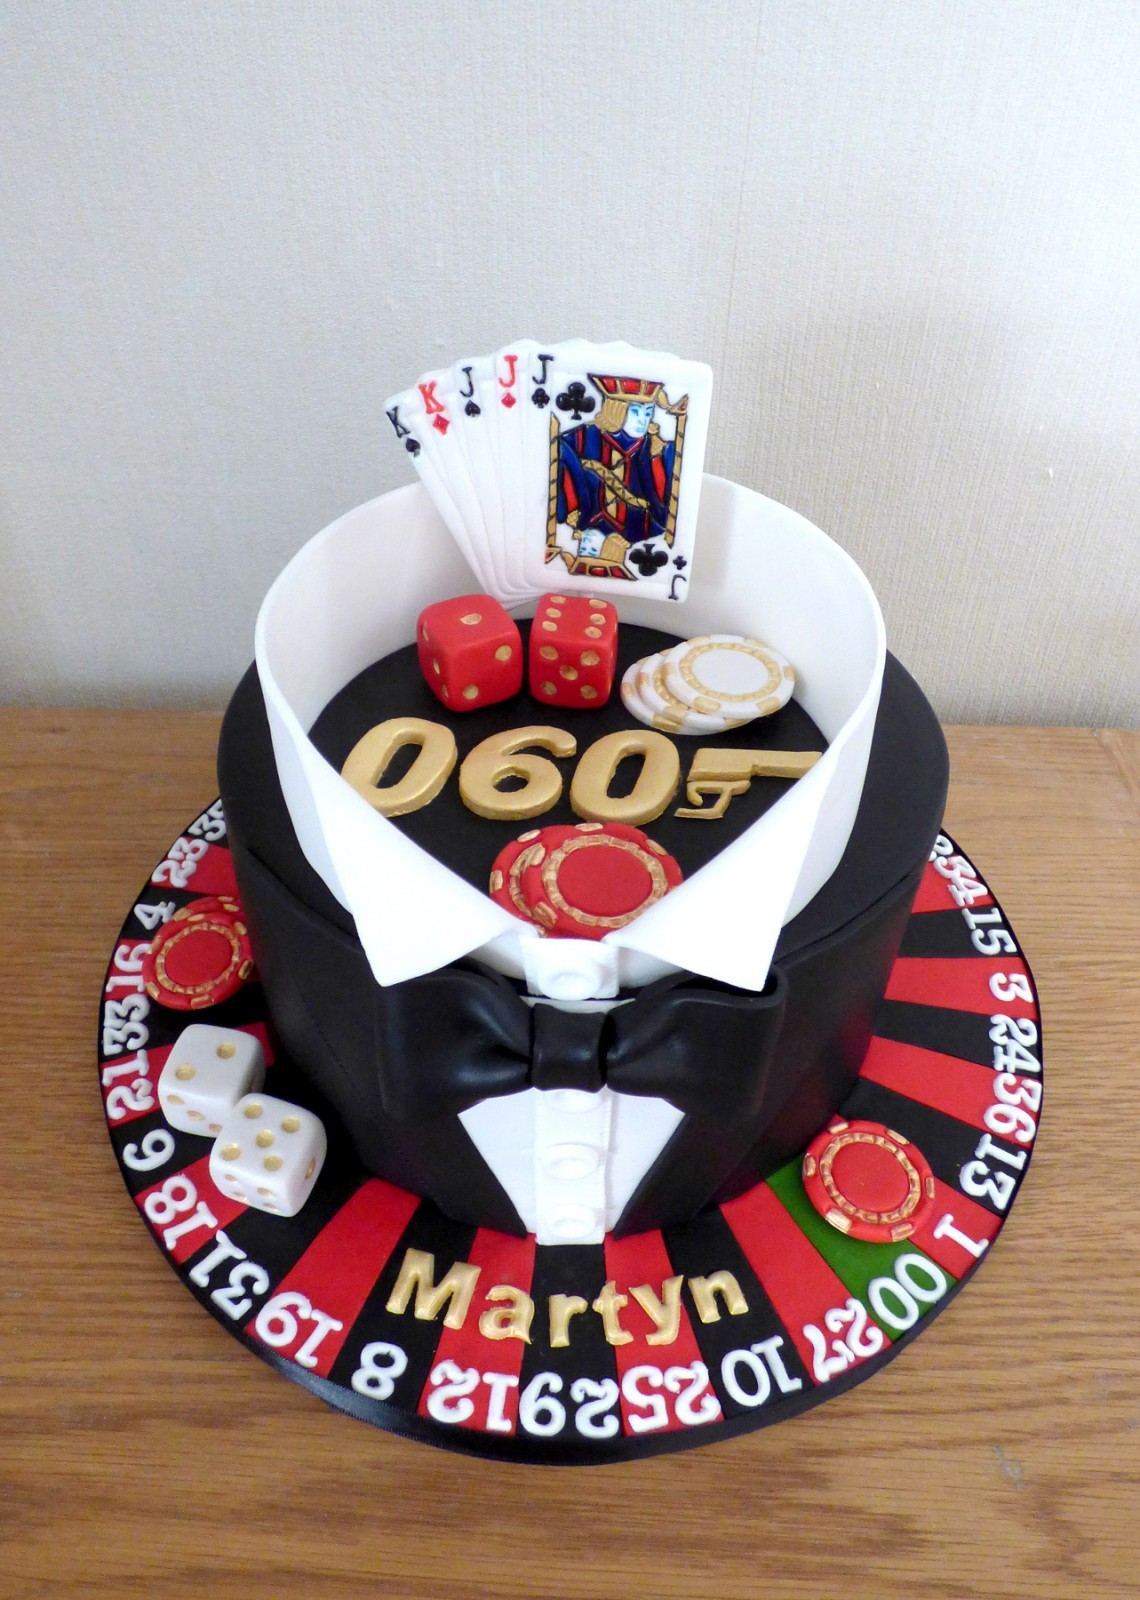 Strange James Bond Casino Royale Themed Birthday Cake Susies Cakes Funny Birthday Cards Online Barepcheapnameinfo